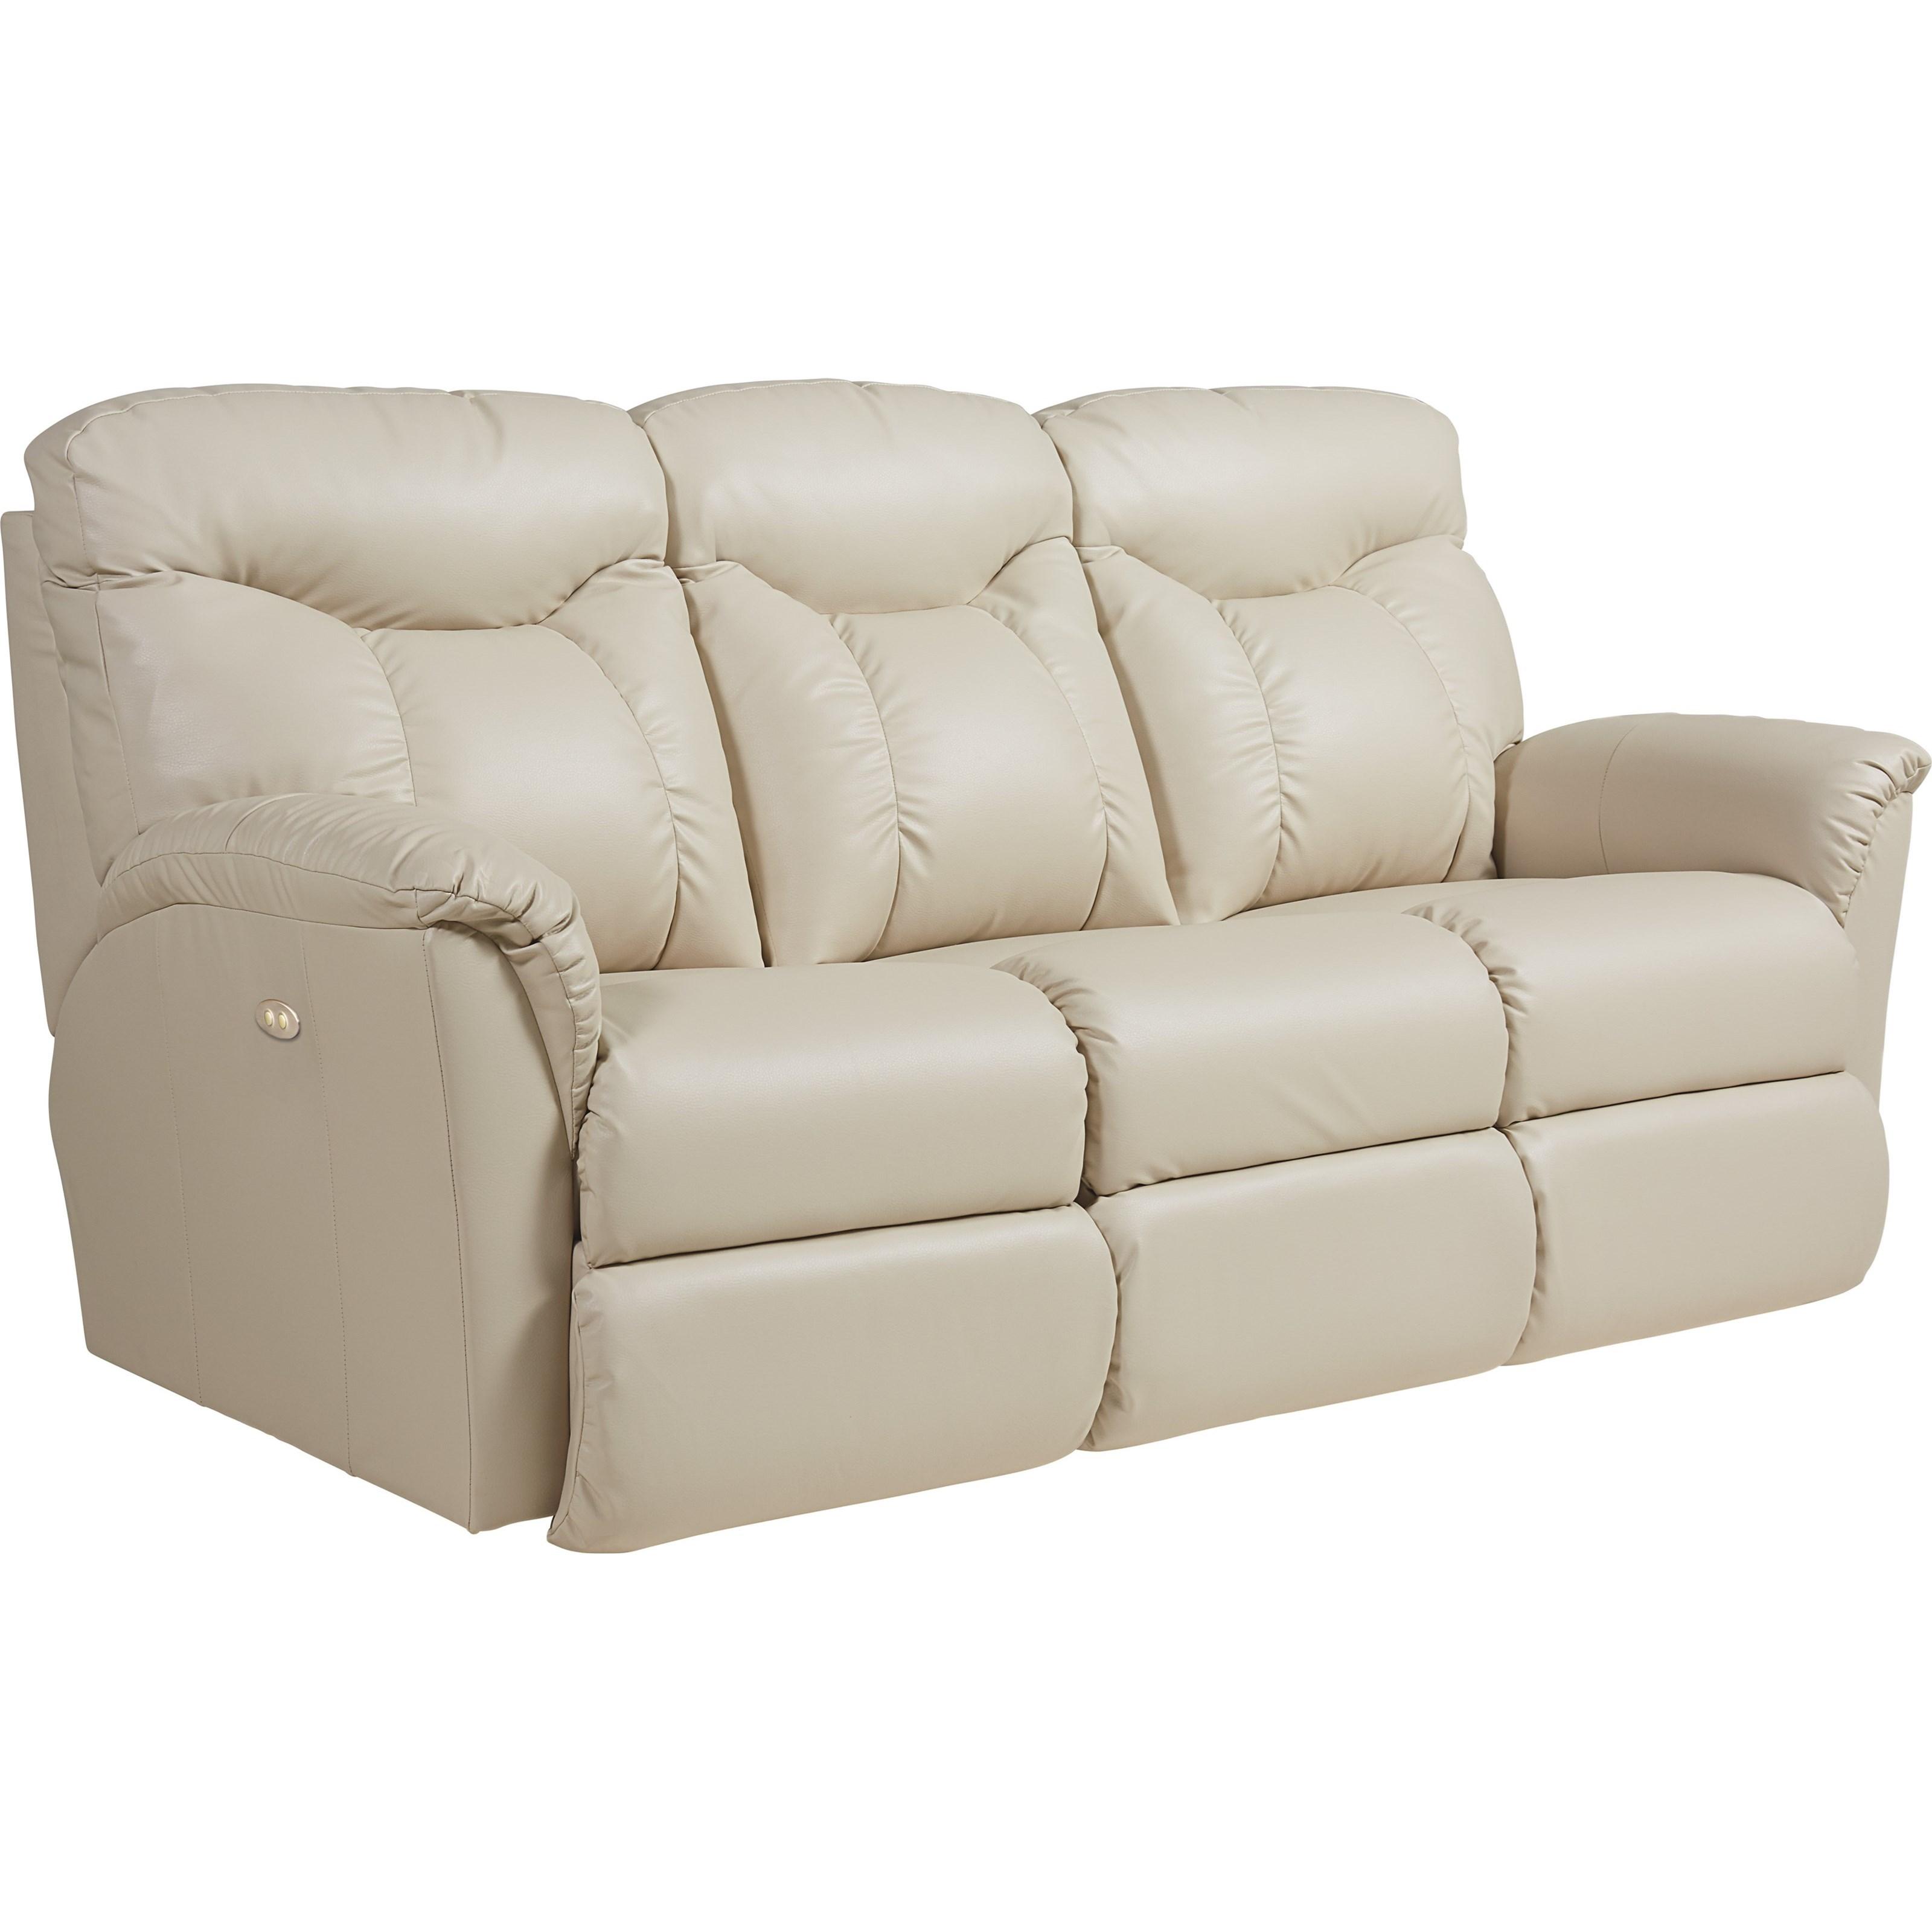 La Z Boy Fortune Power Reclining Sofa Bullard Furniture